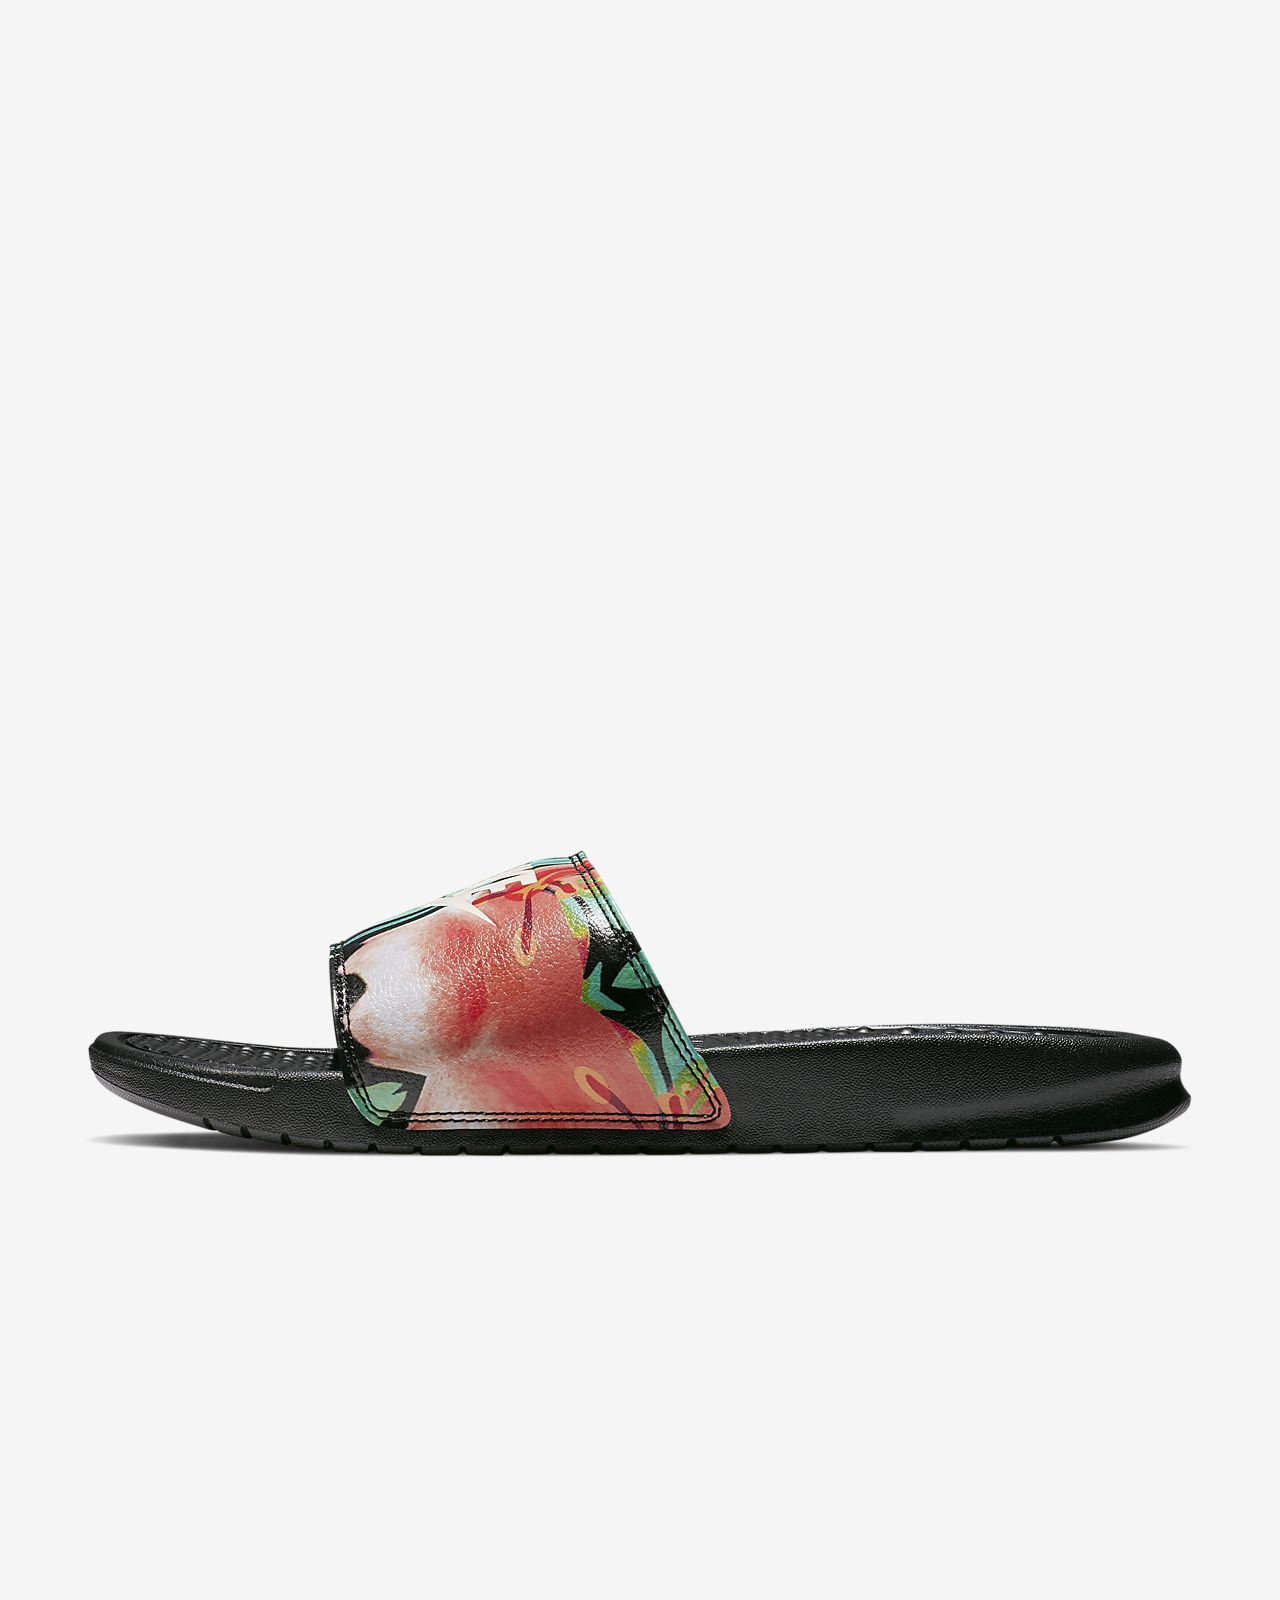 eecfc06b429014 Nike Benassi JDI Floral Women s Slide. Nike.com AU